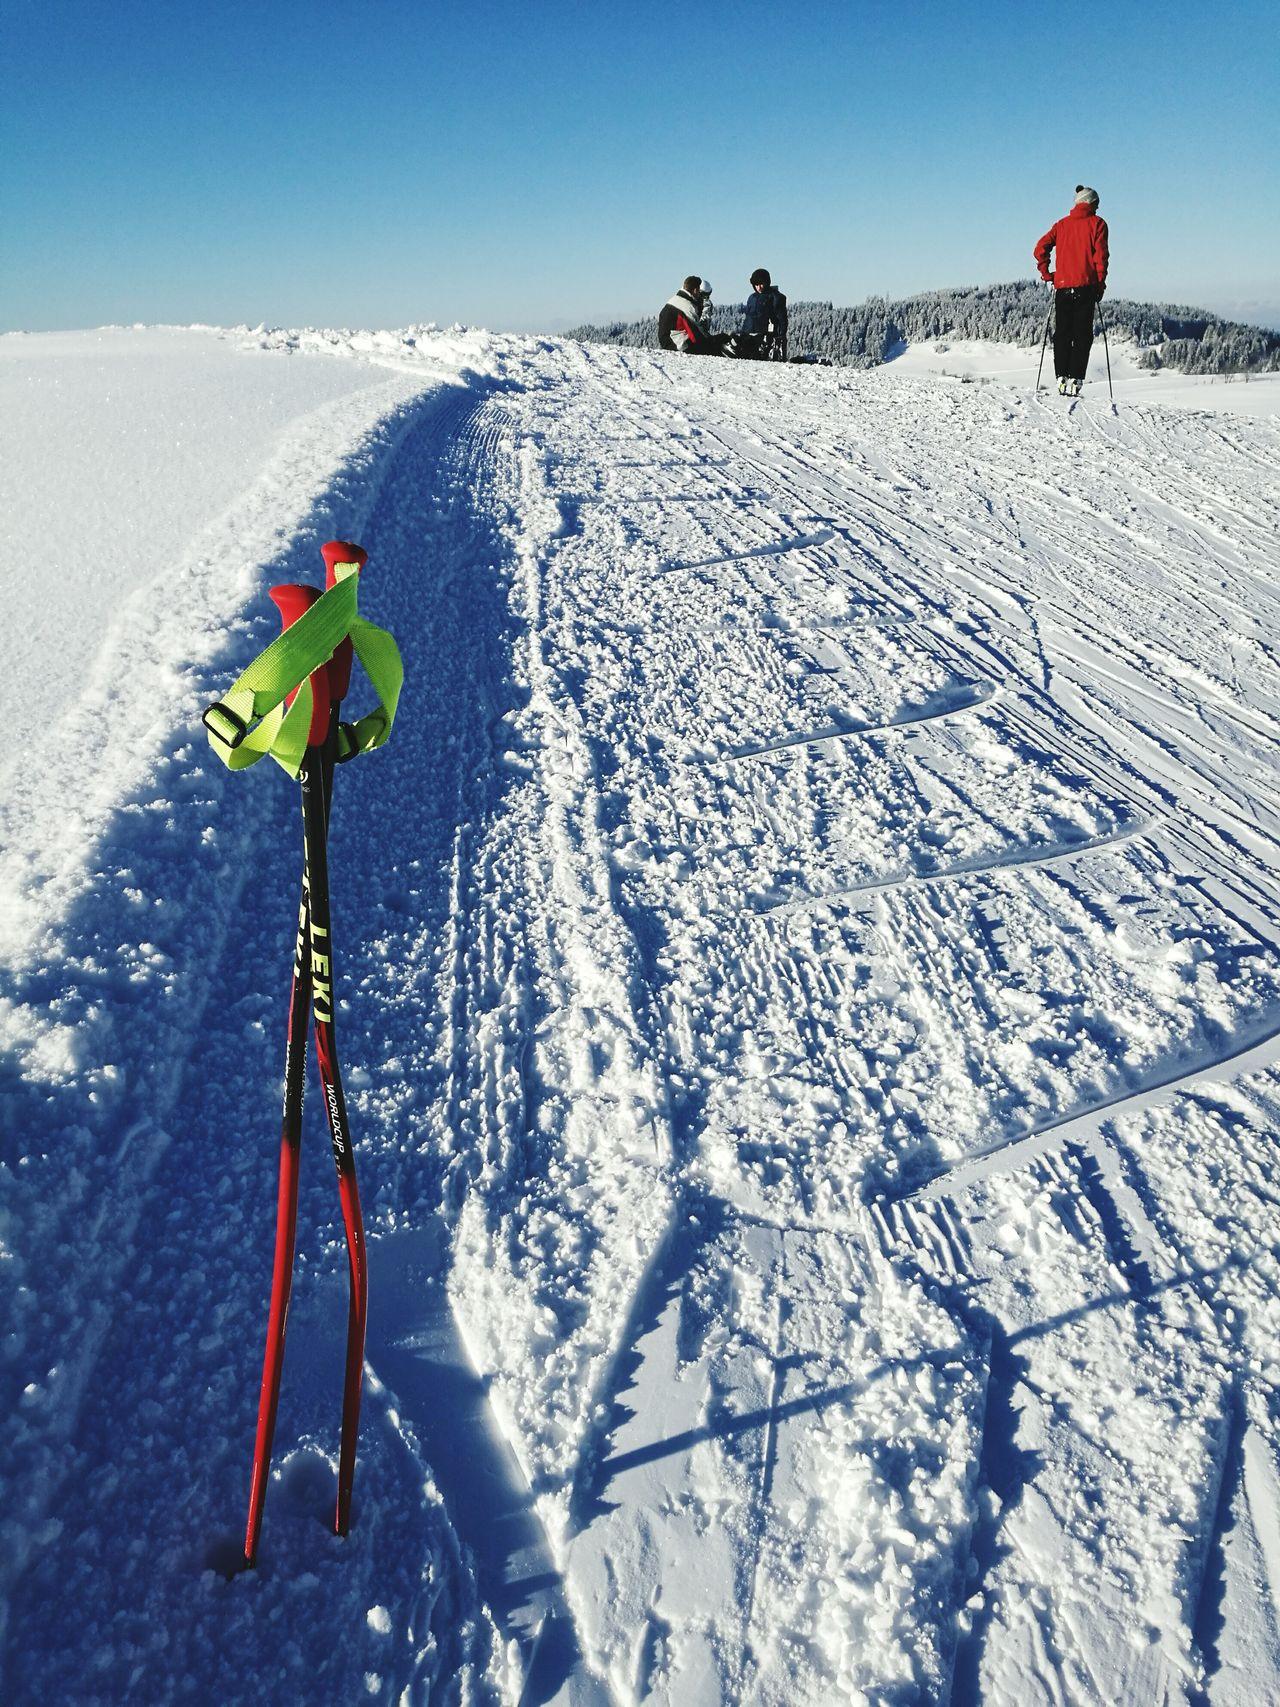 Perfect conditions today! Snow Day Winter Cold Temperature Sport People Mountain Snowboarding Skiing Heilige Drei Könige Cold Winter ❄⛄ Wiederhofen Allgäu Missen Wilhams